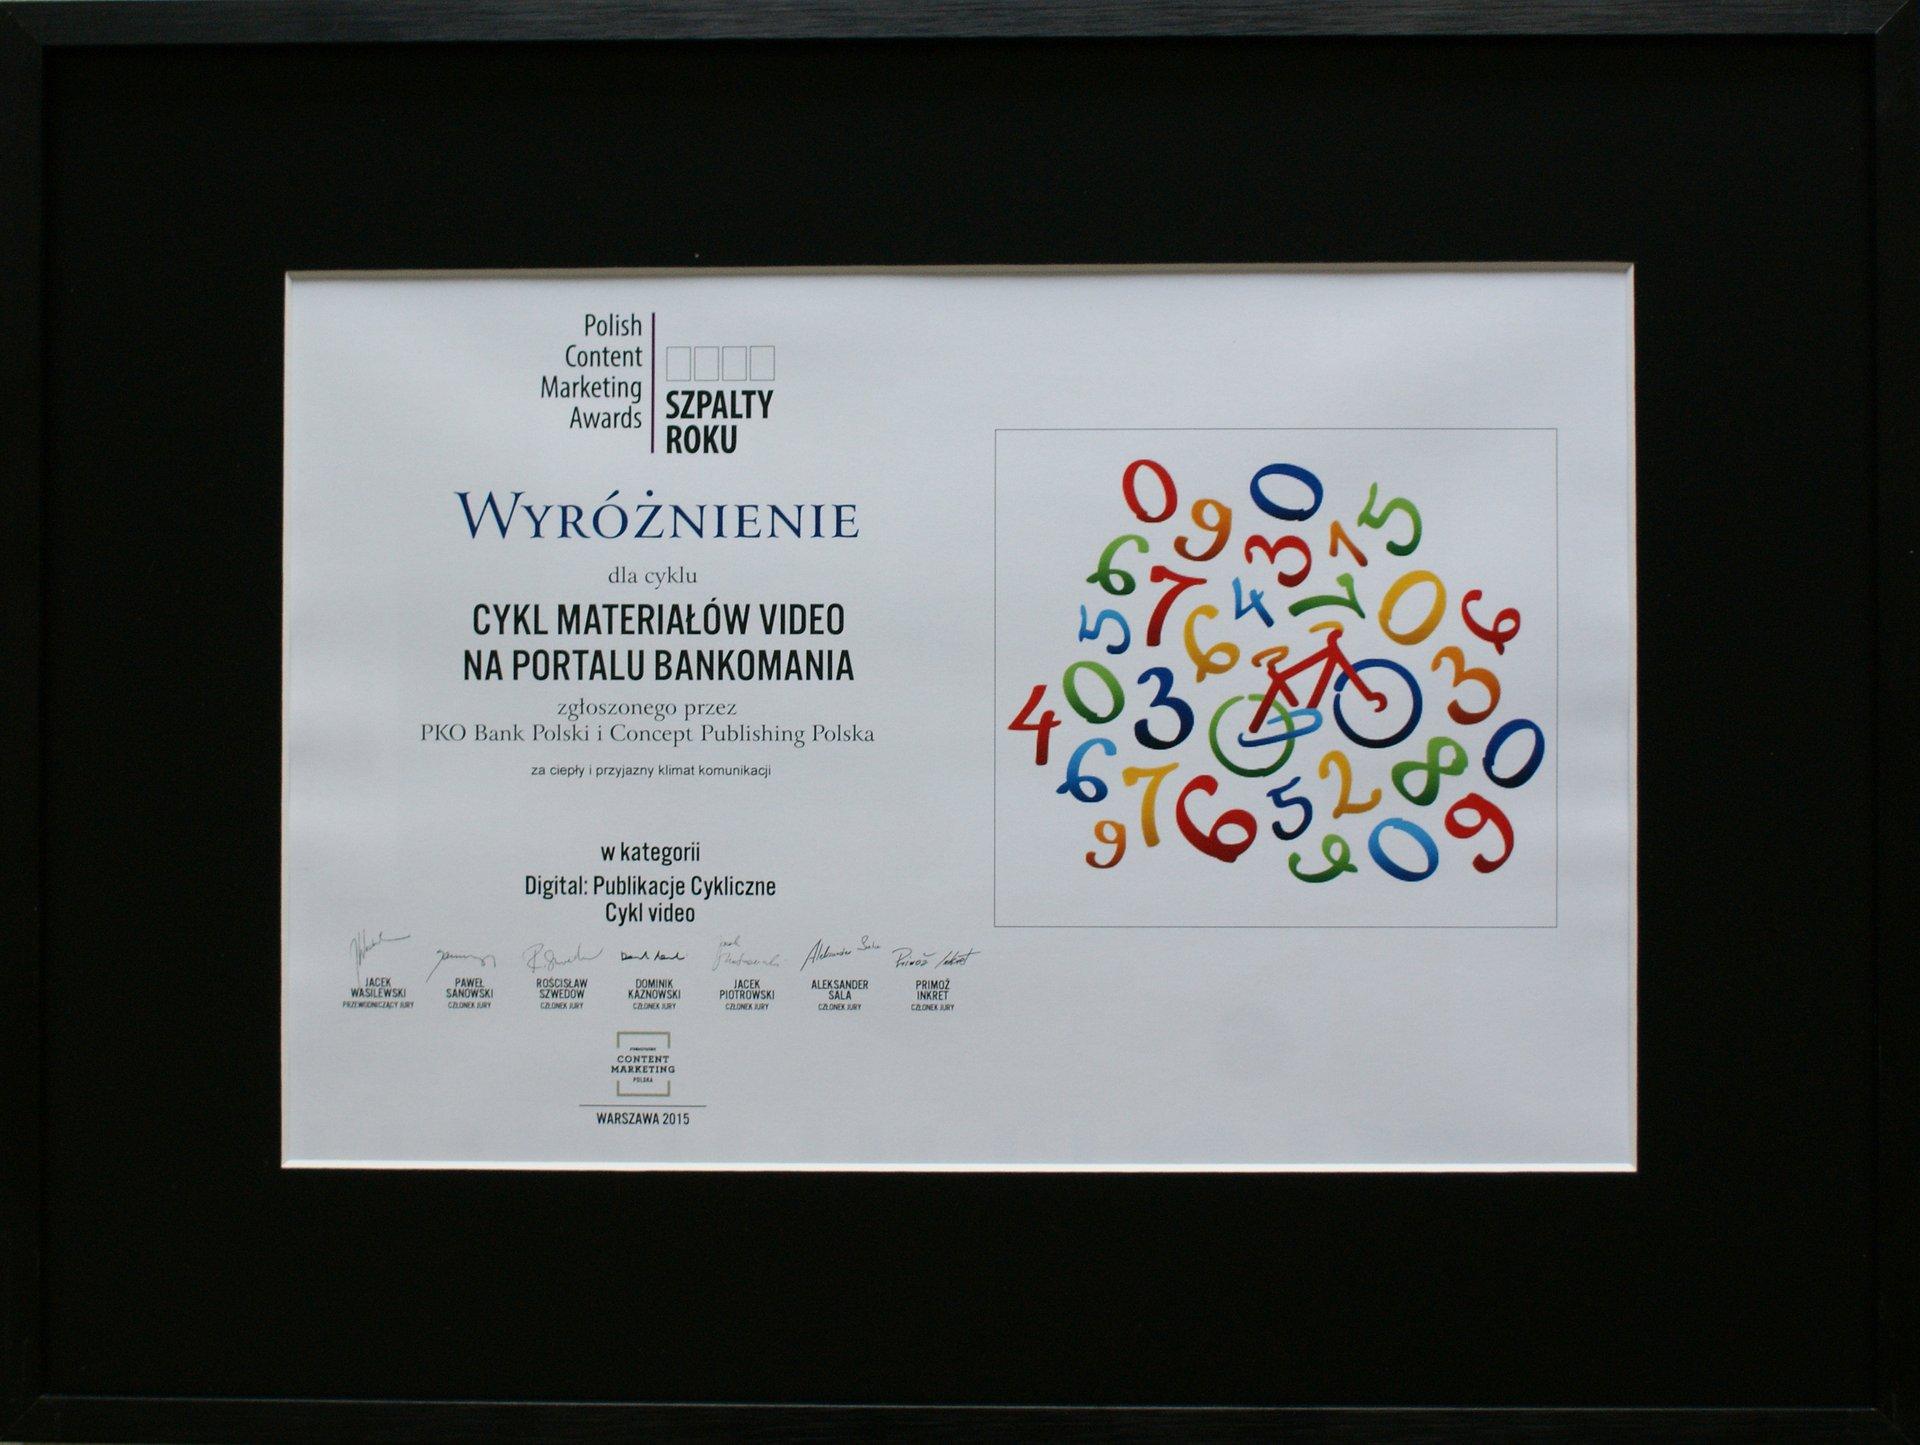 Bankomania nagrodzona w konkursie Polish Content Marketing 2015